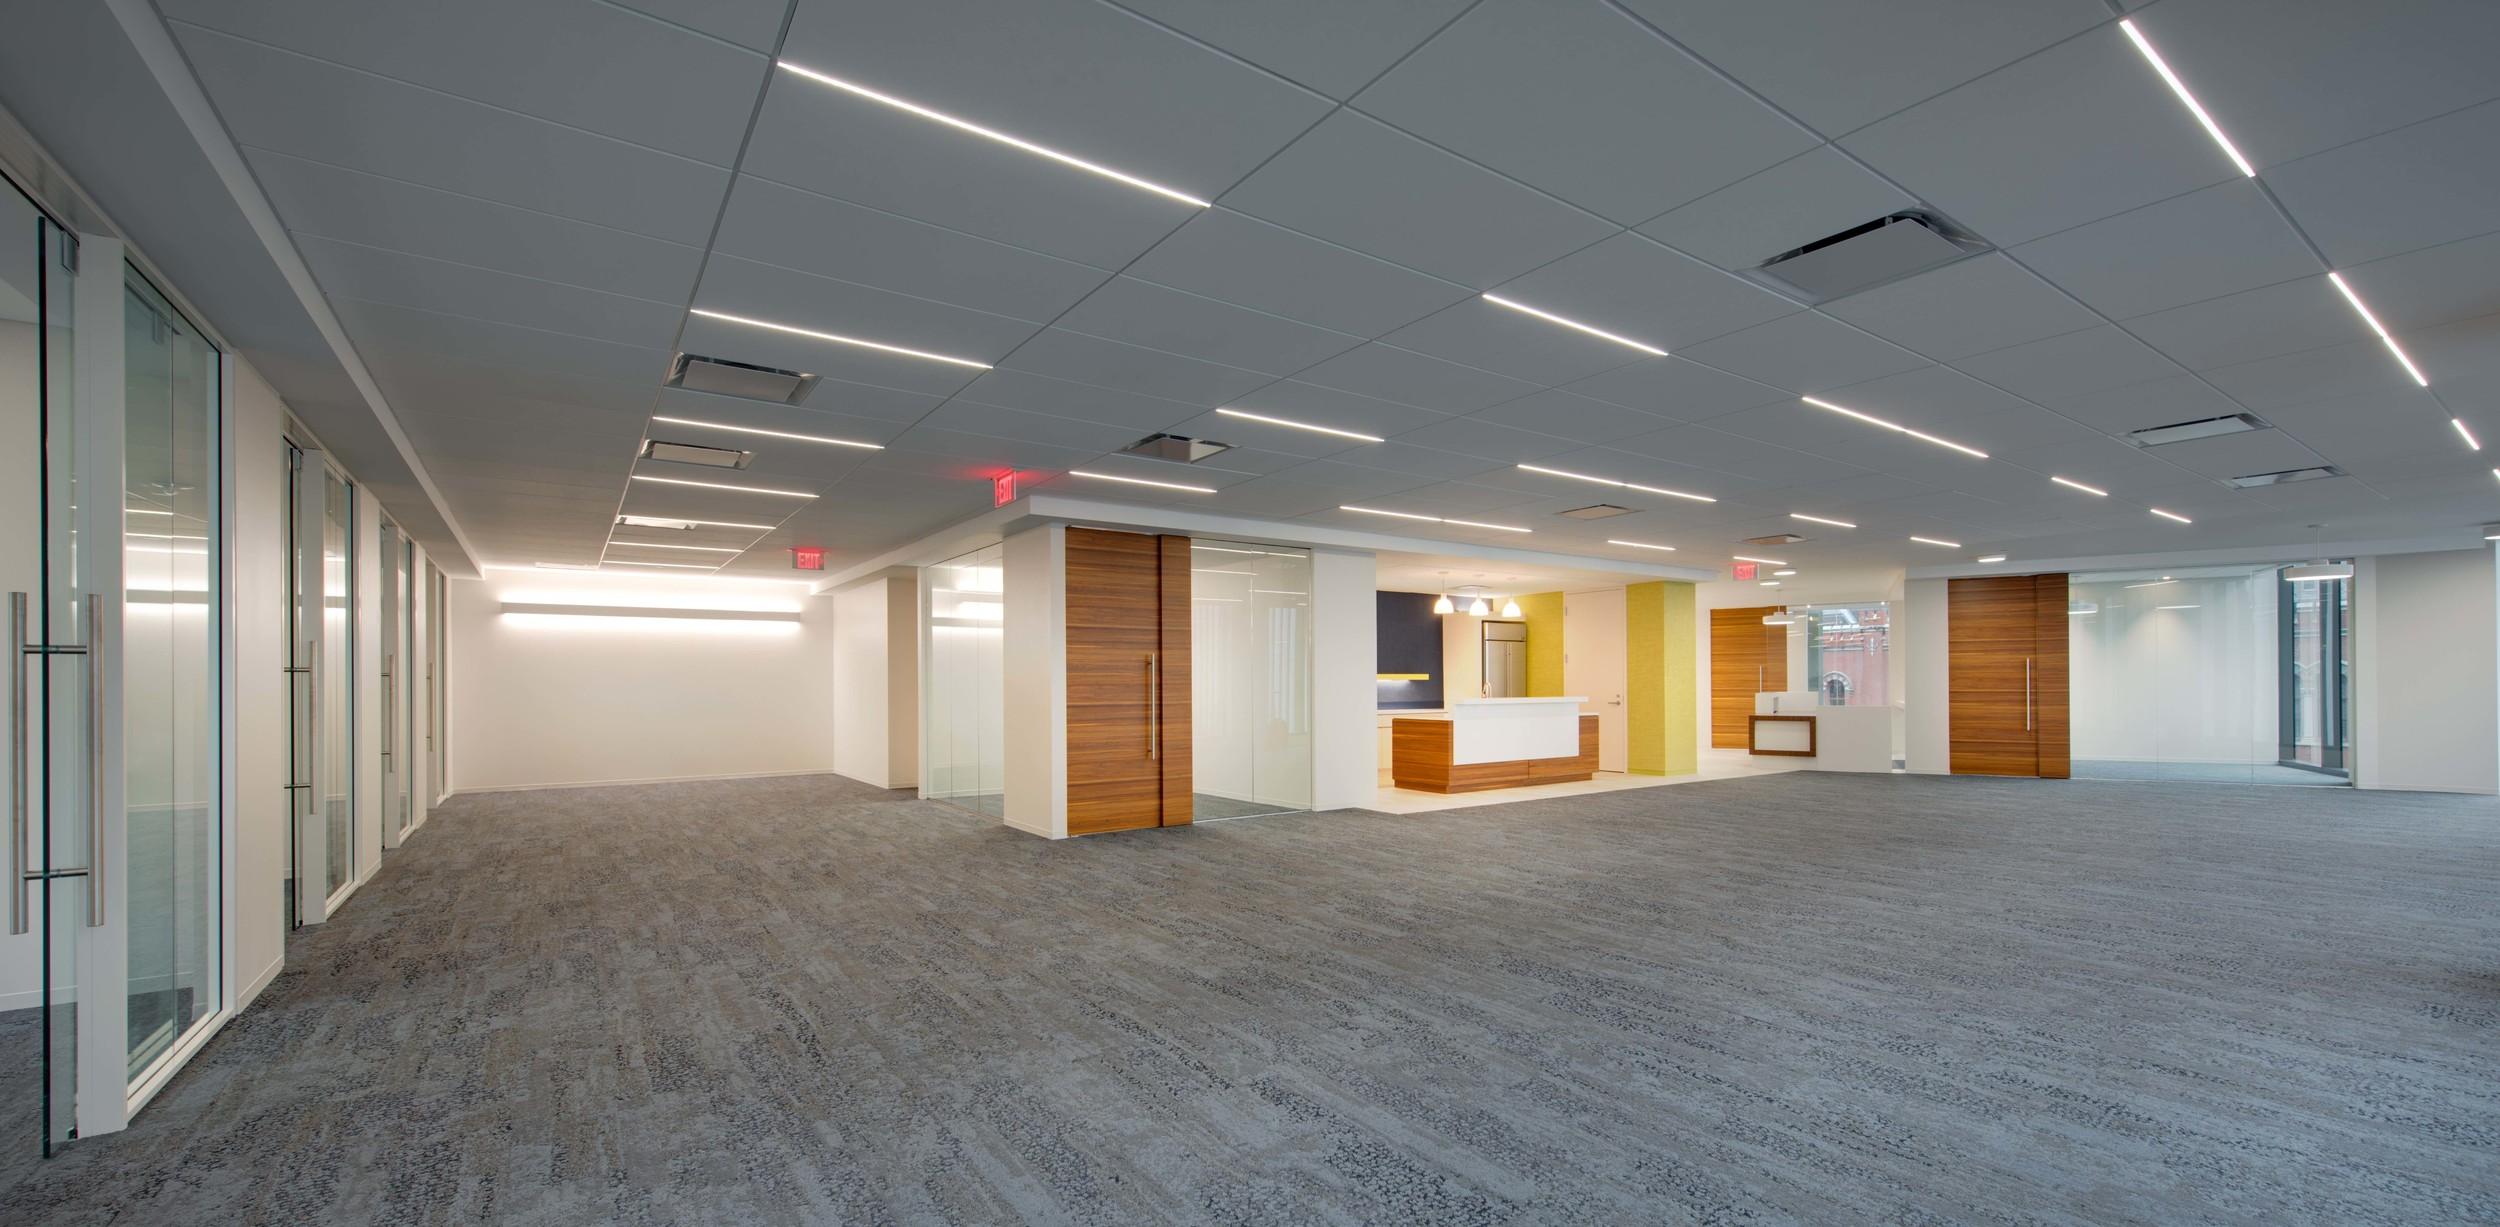 1200 17th Office Suite Interior Image 216417.jpg